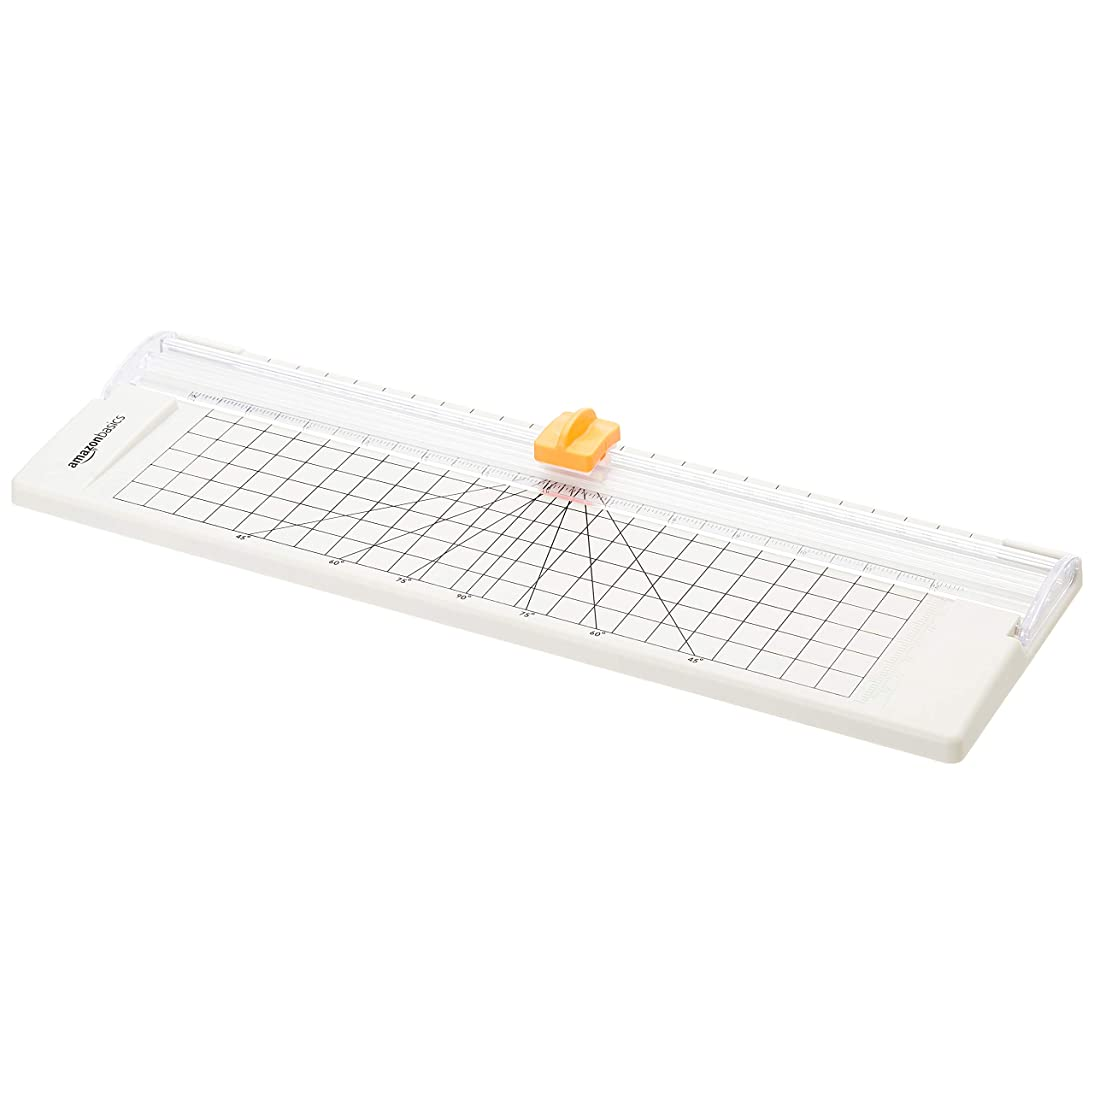 AmazonBasics Craft Paper Trimmer, 12 Inch Cut